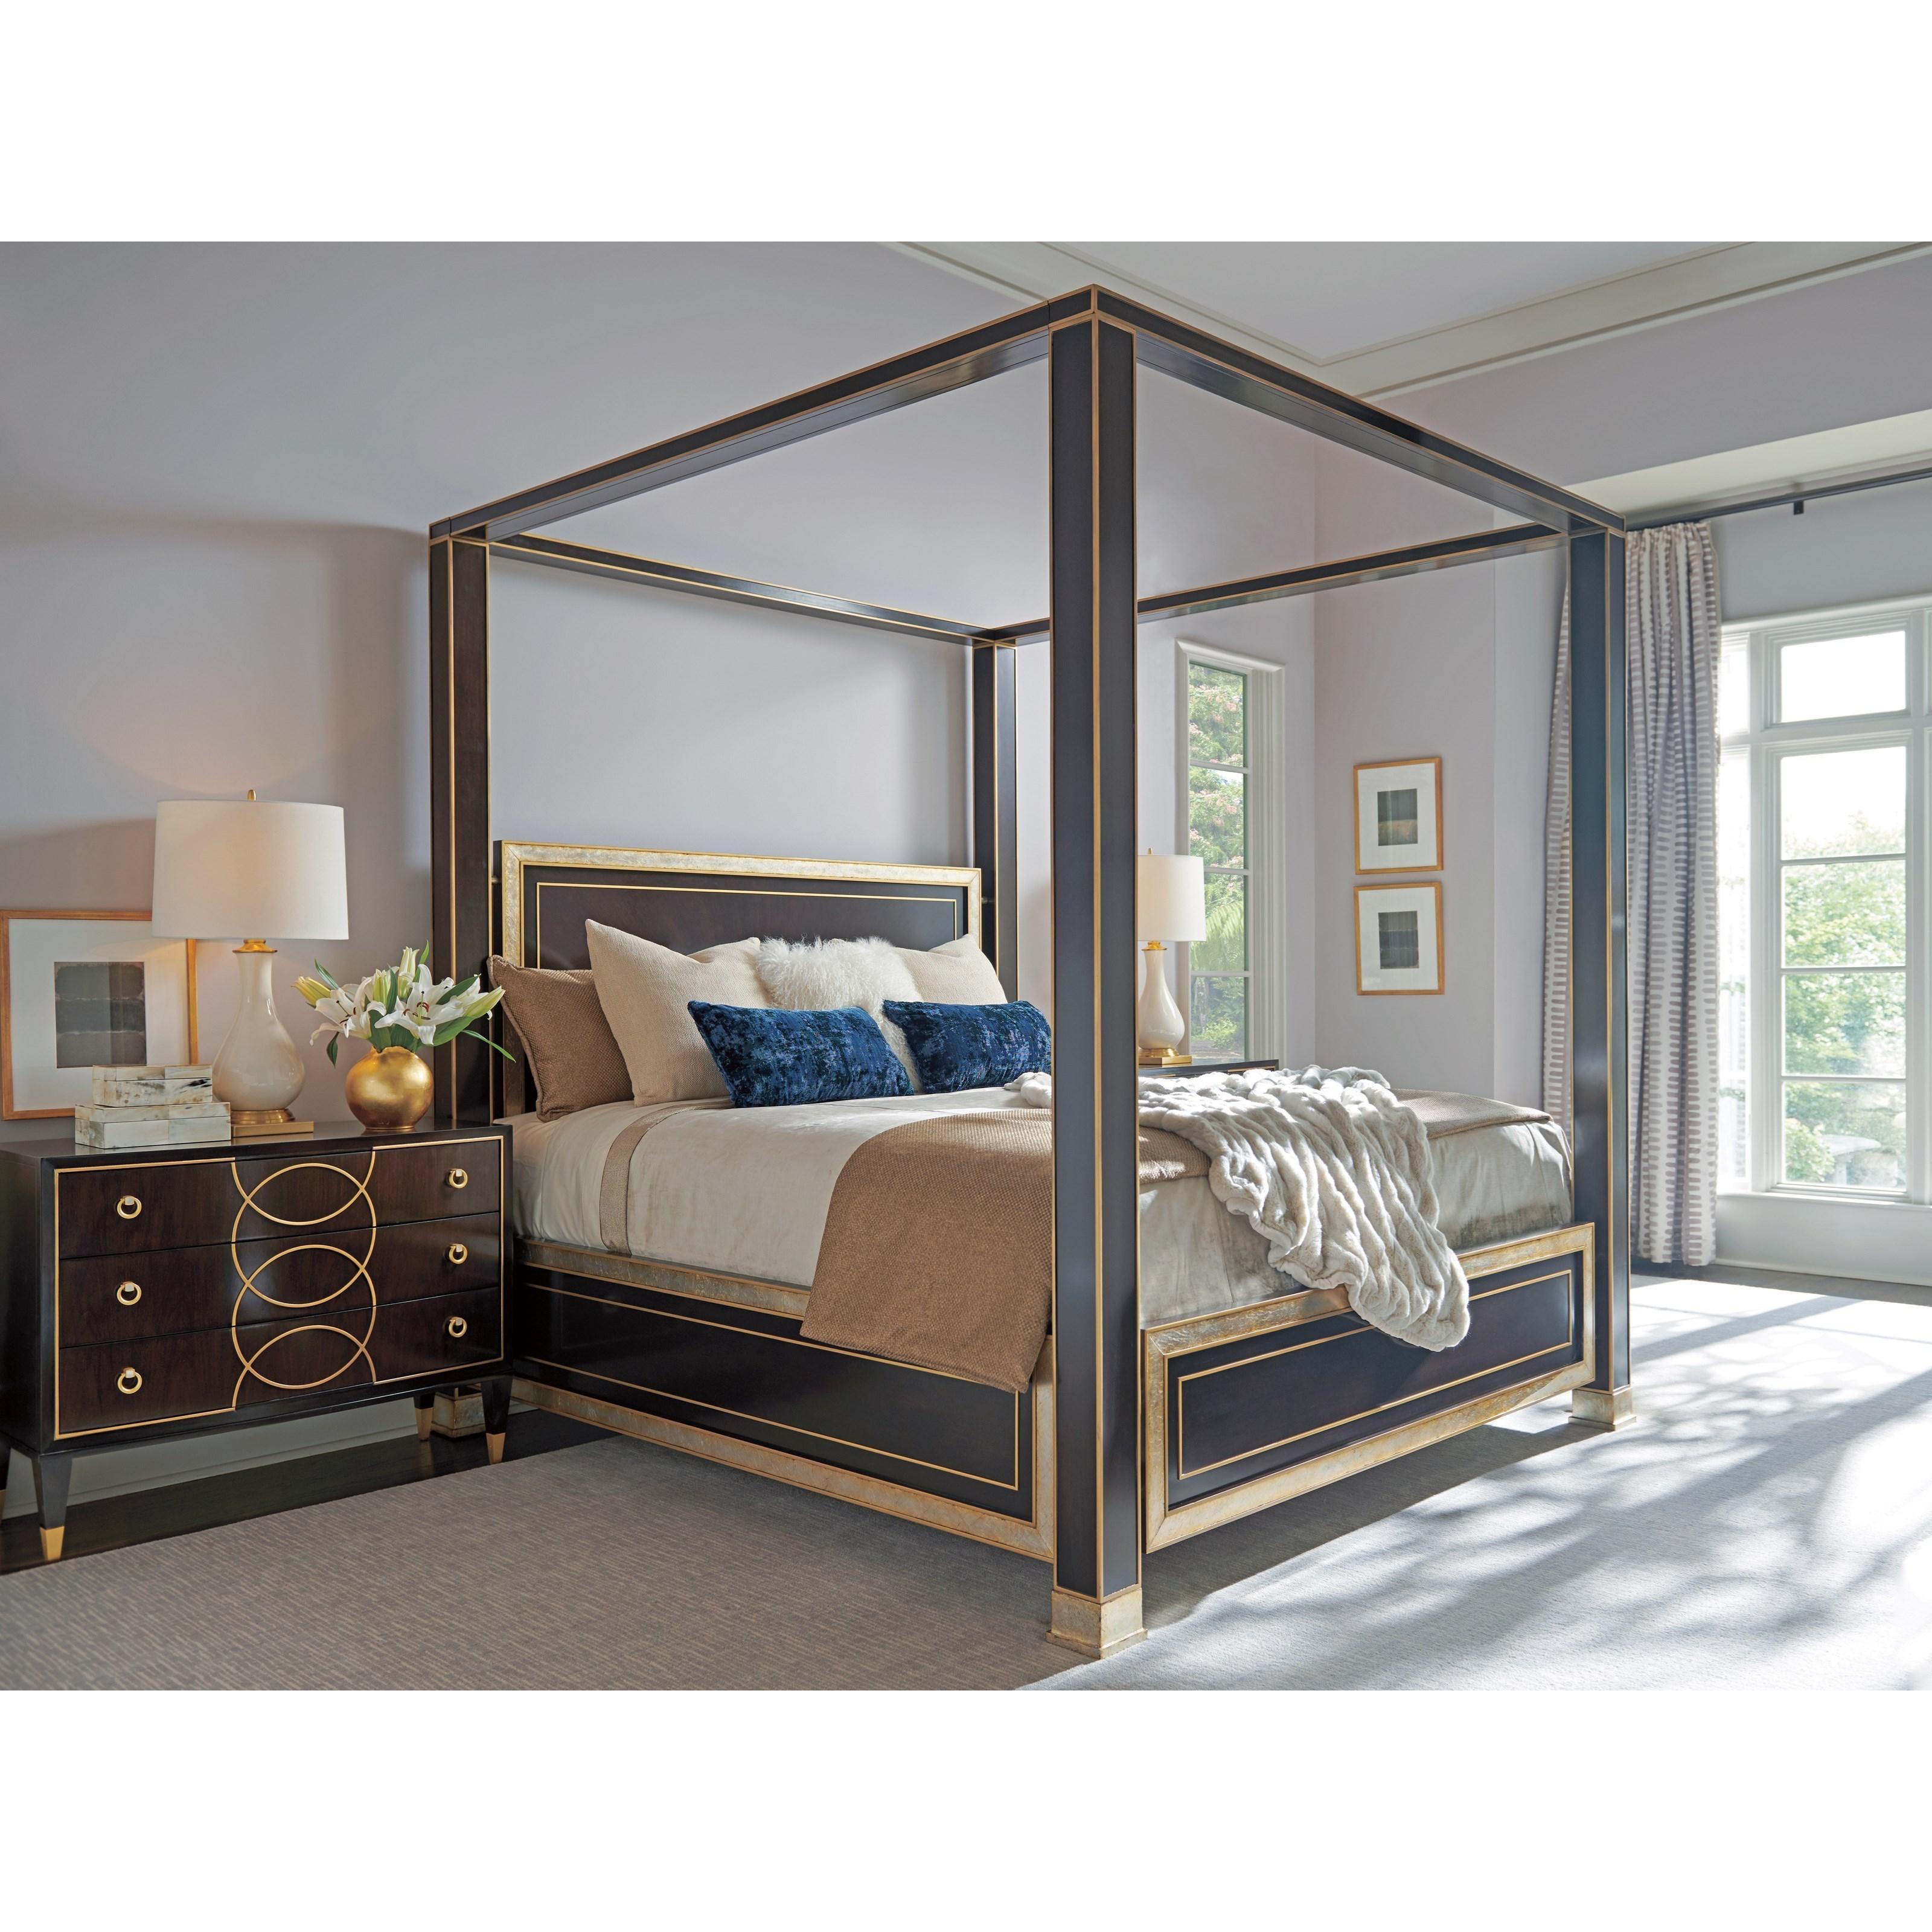 Carlyle California King Bedroom Group by Lexington at Furniture Fair - North Carolina